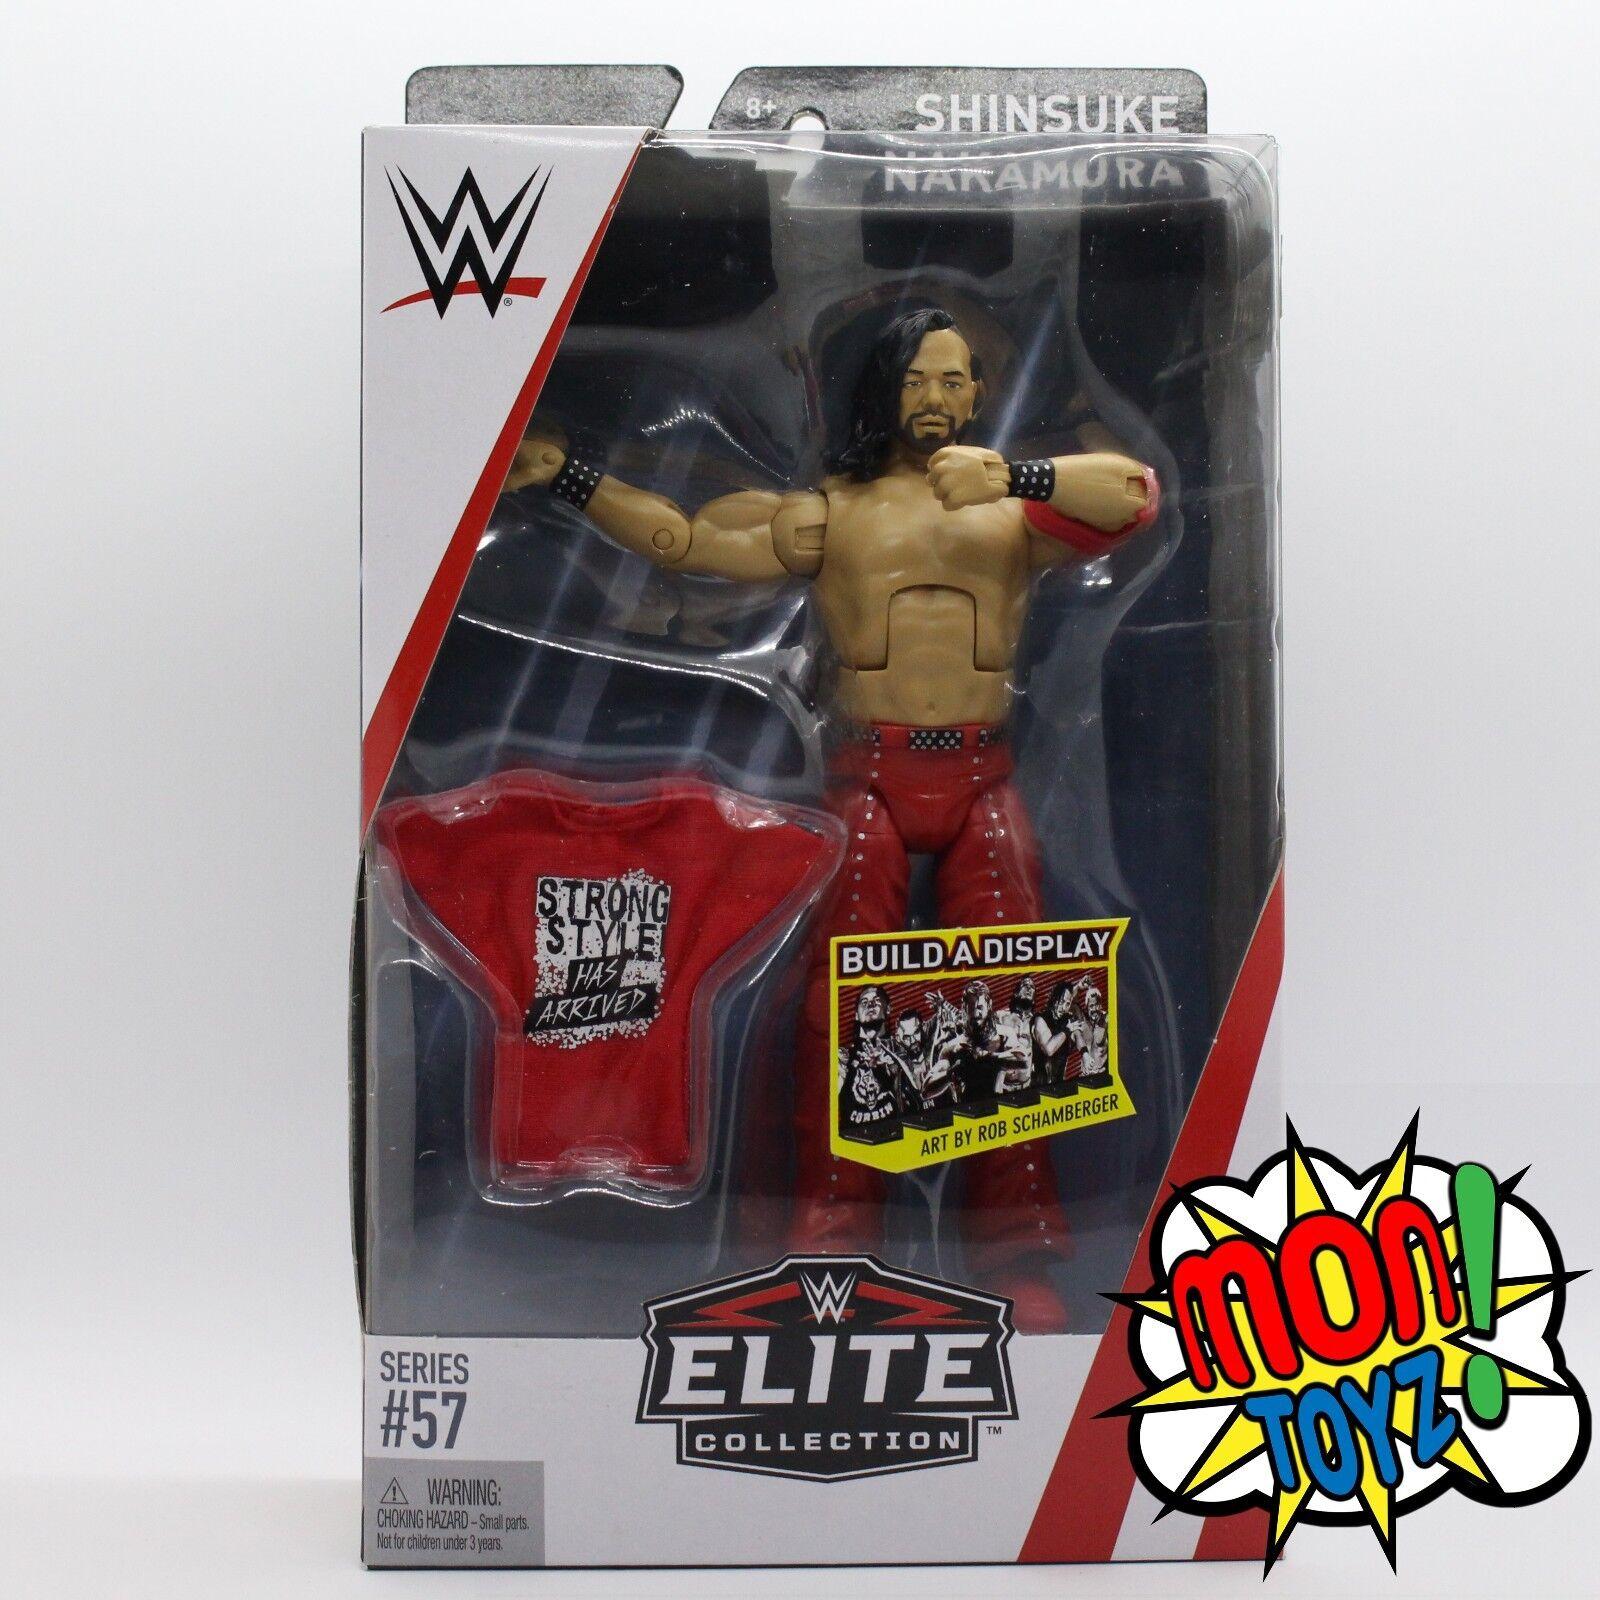 Shinsuke Nakamura WWE Mattel Elite Series 57 Action Figure NEW HTF